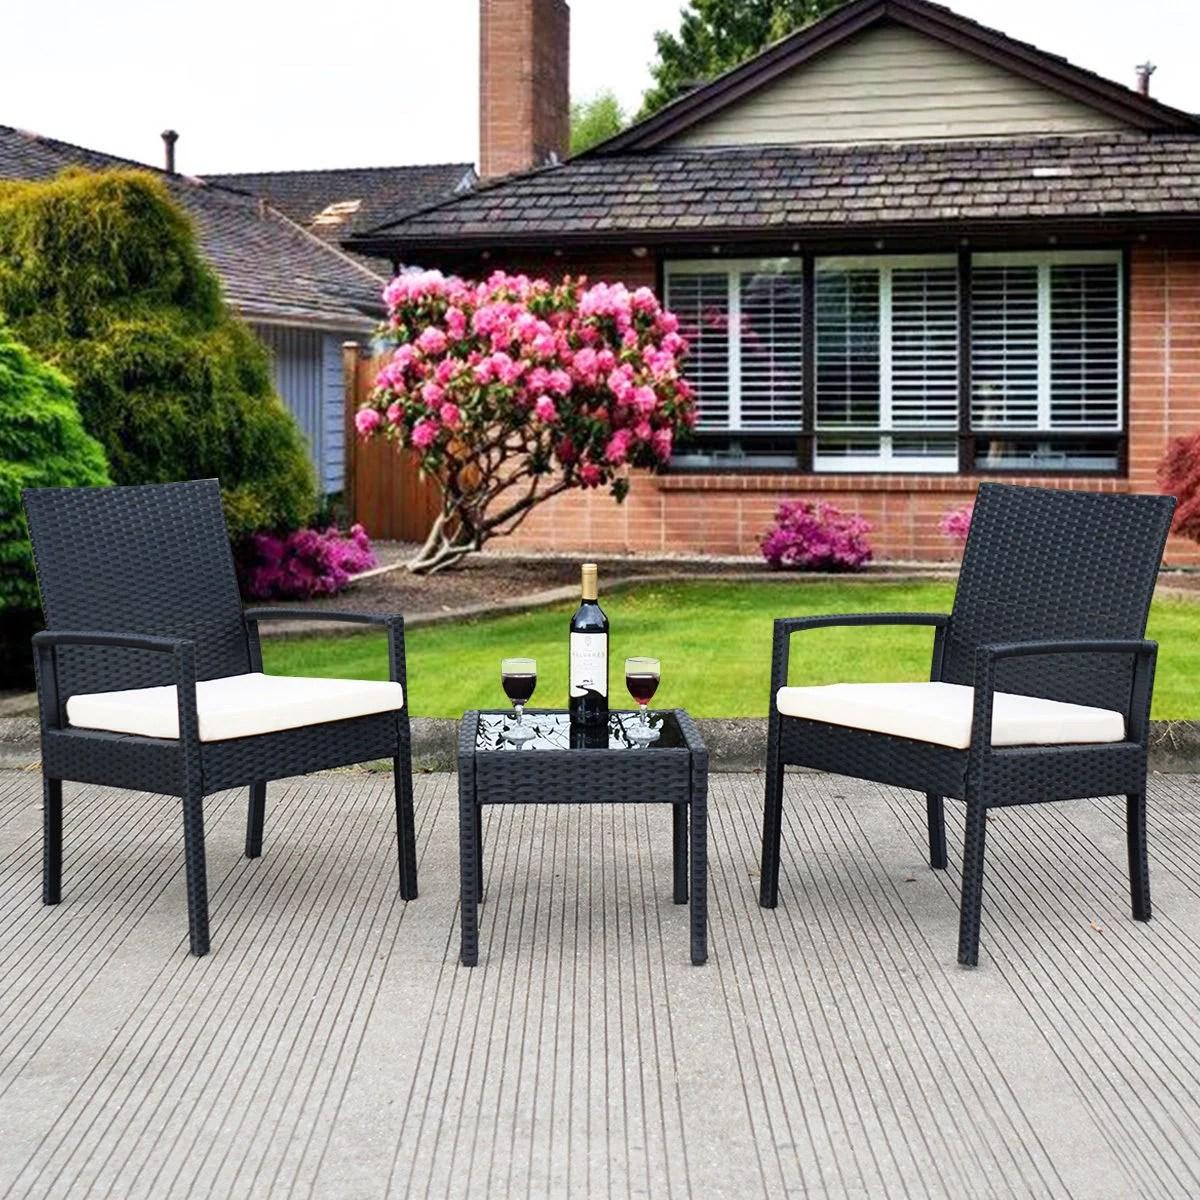 deal 3 ps outdoor rattan patio furniture set backyard garden furniture